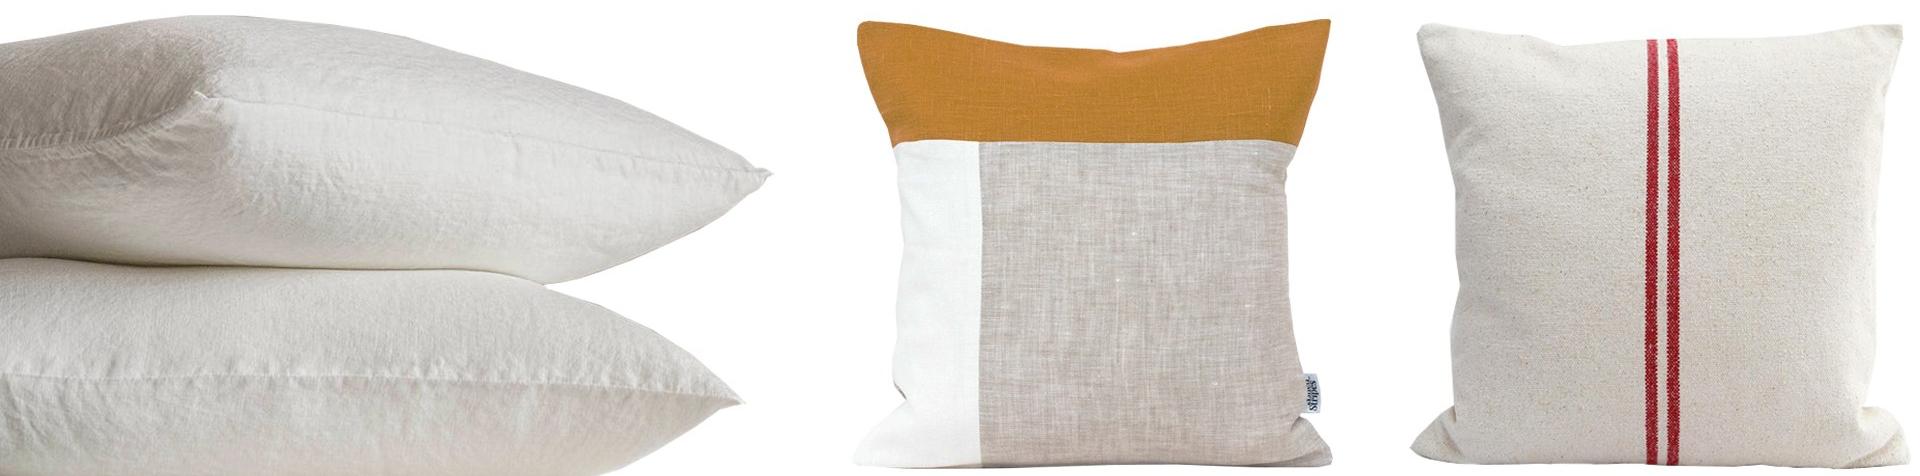 cushions_01